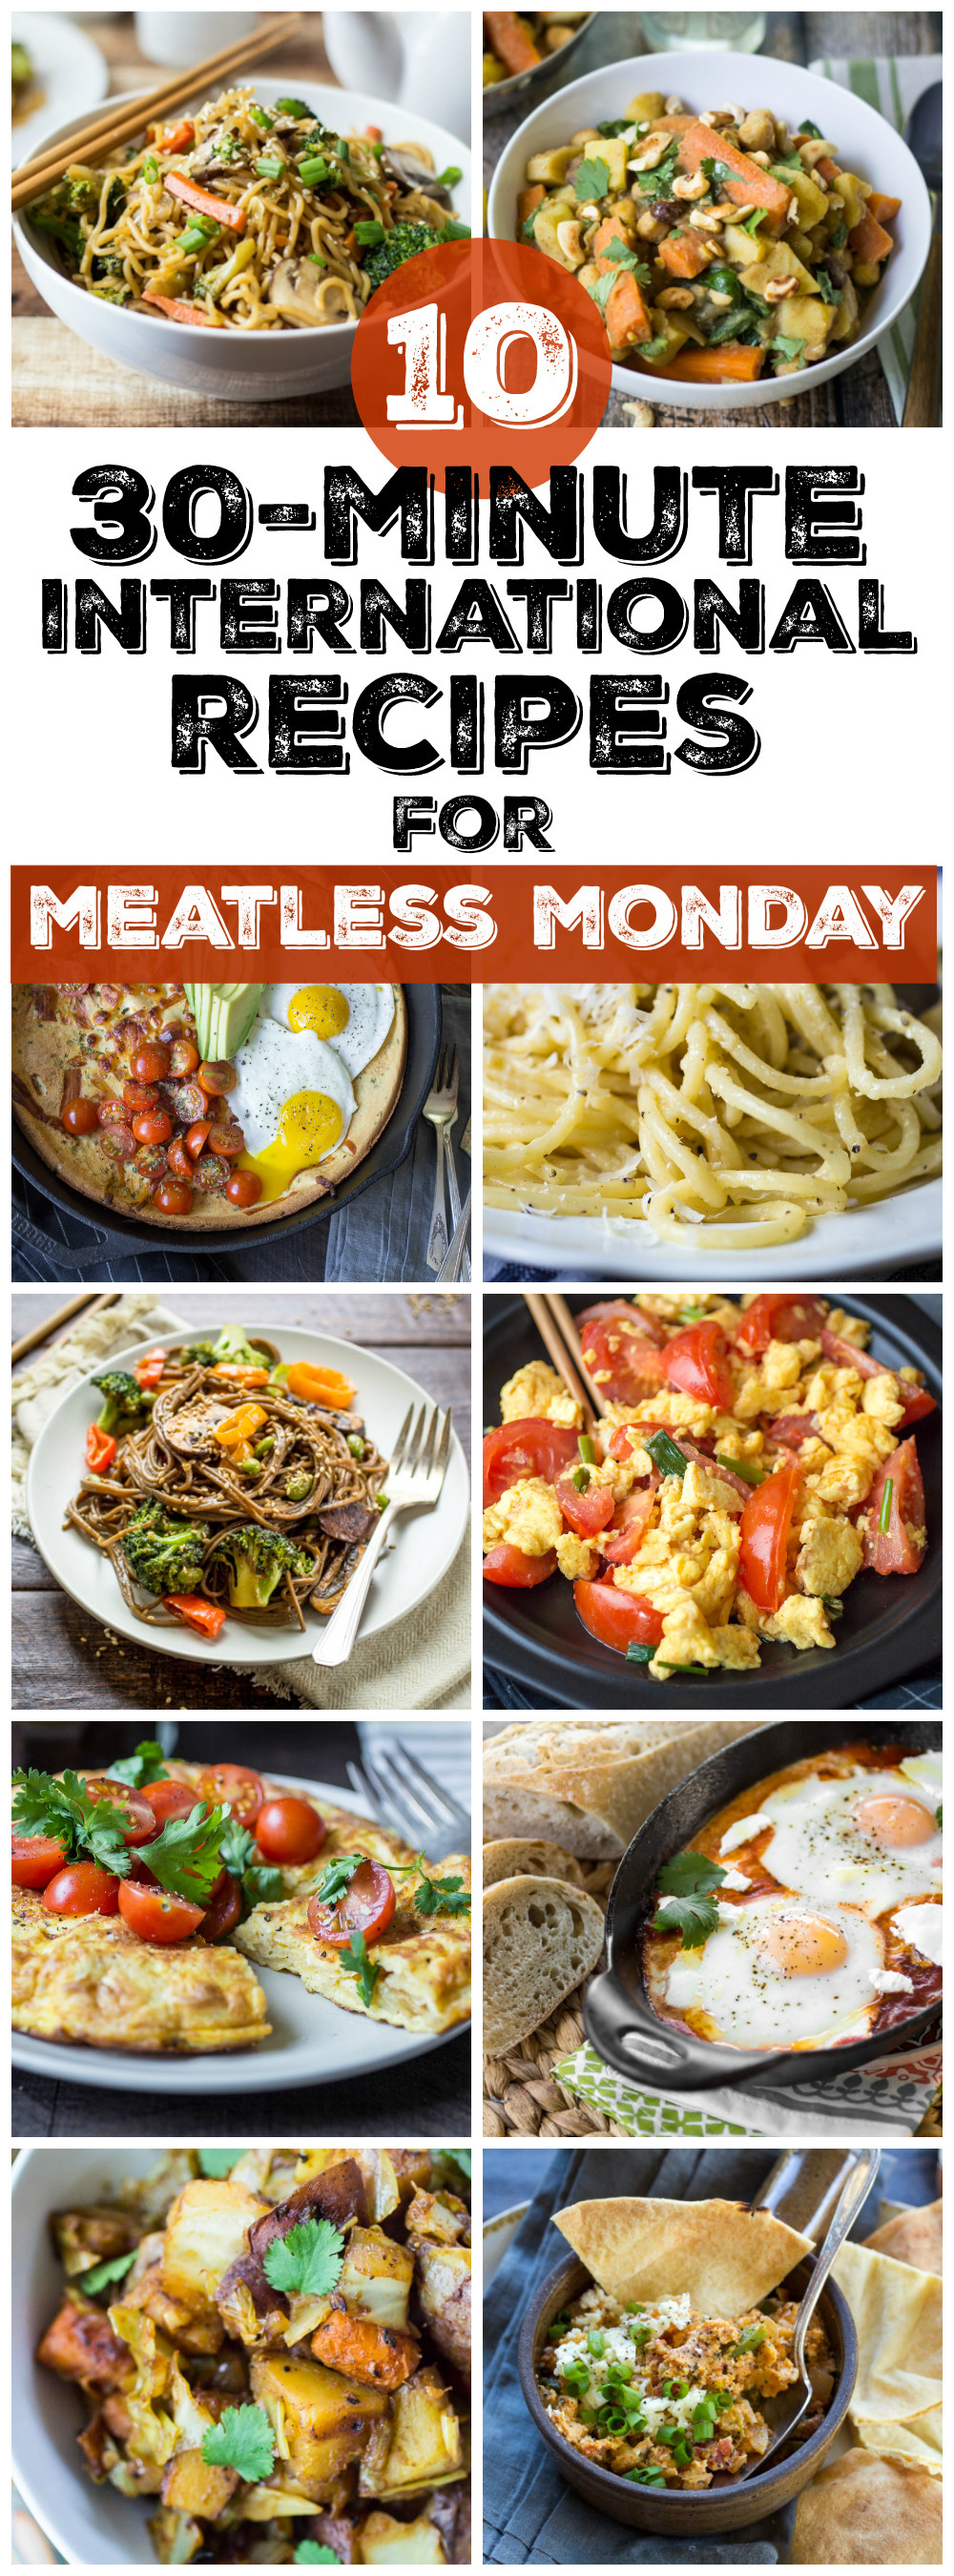 Easy Dinner Recipes Vegetarian  10 Easy Ve arian Dinner Recipes from Around the World